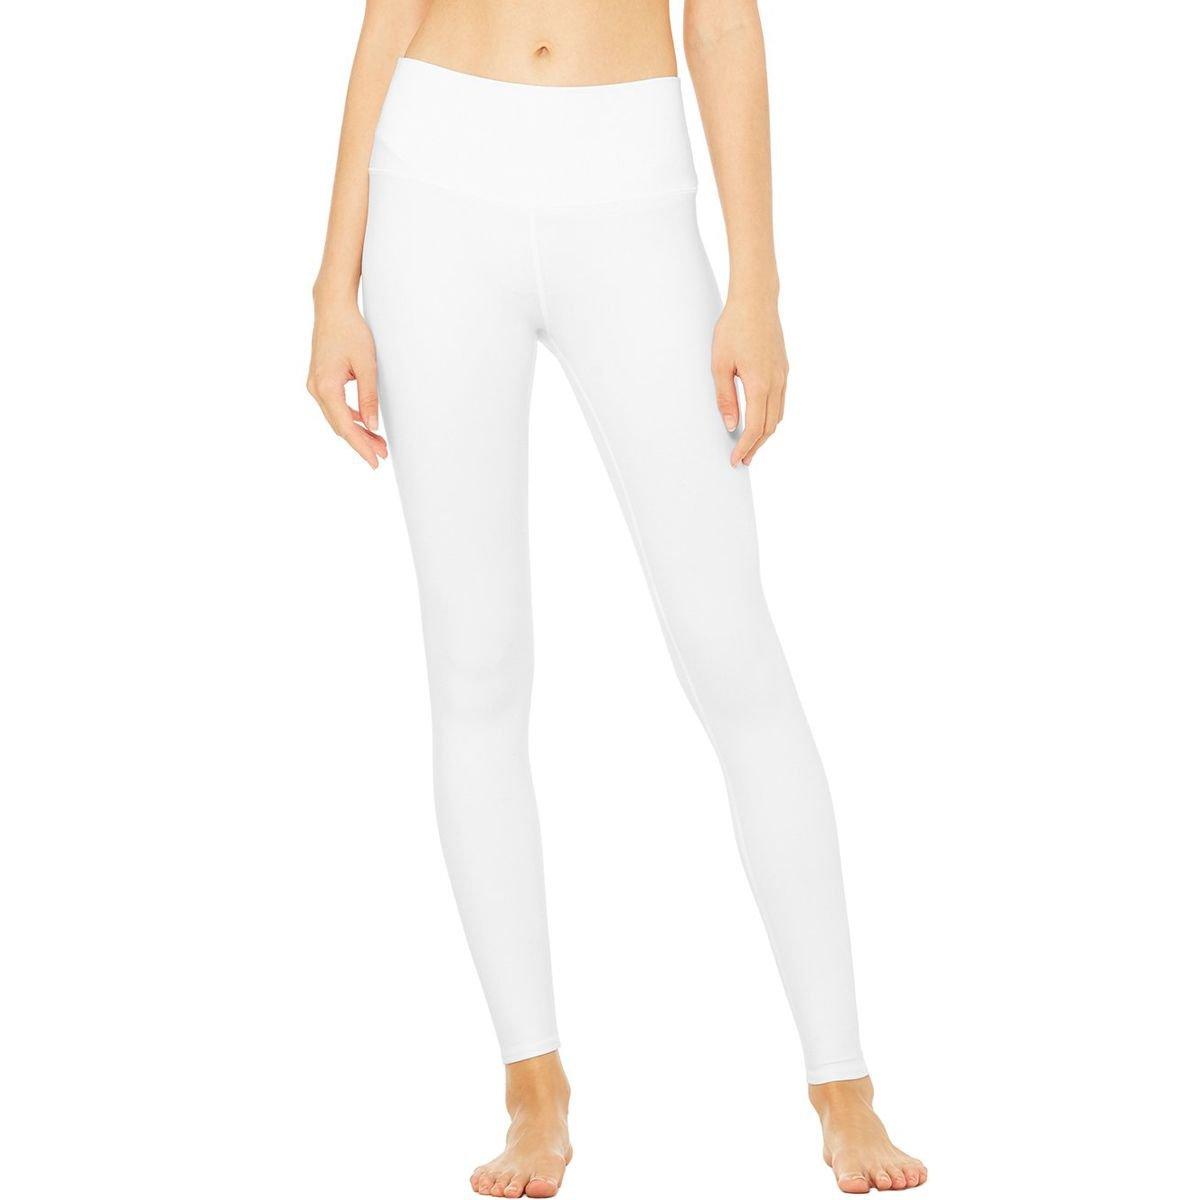 Alo Yoga Women's High Waist Airbrush Legging, White, XXS